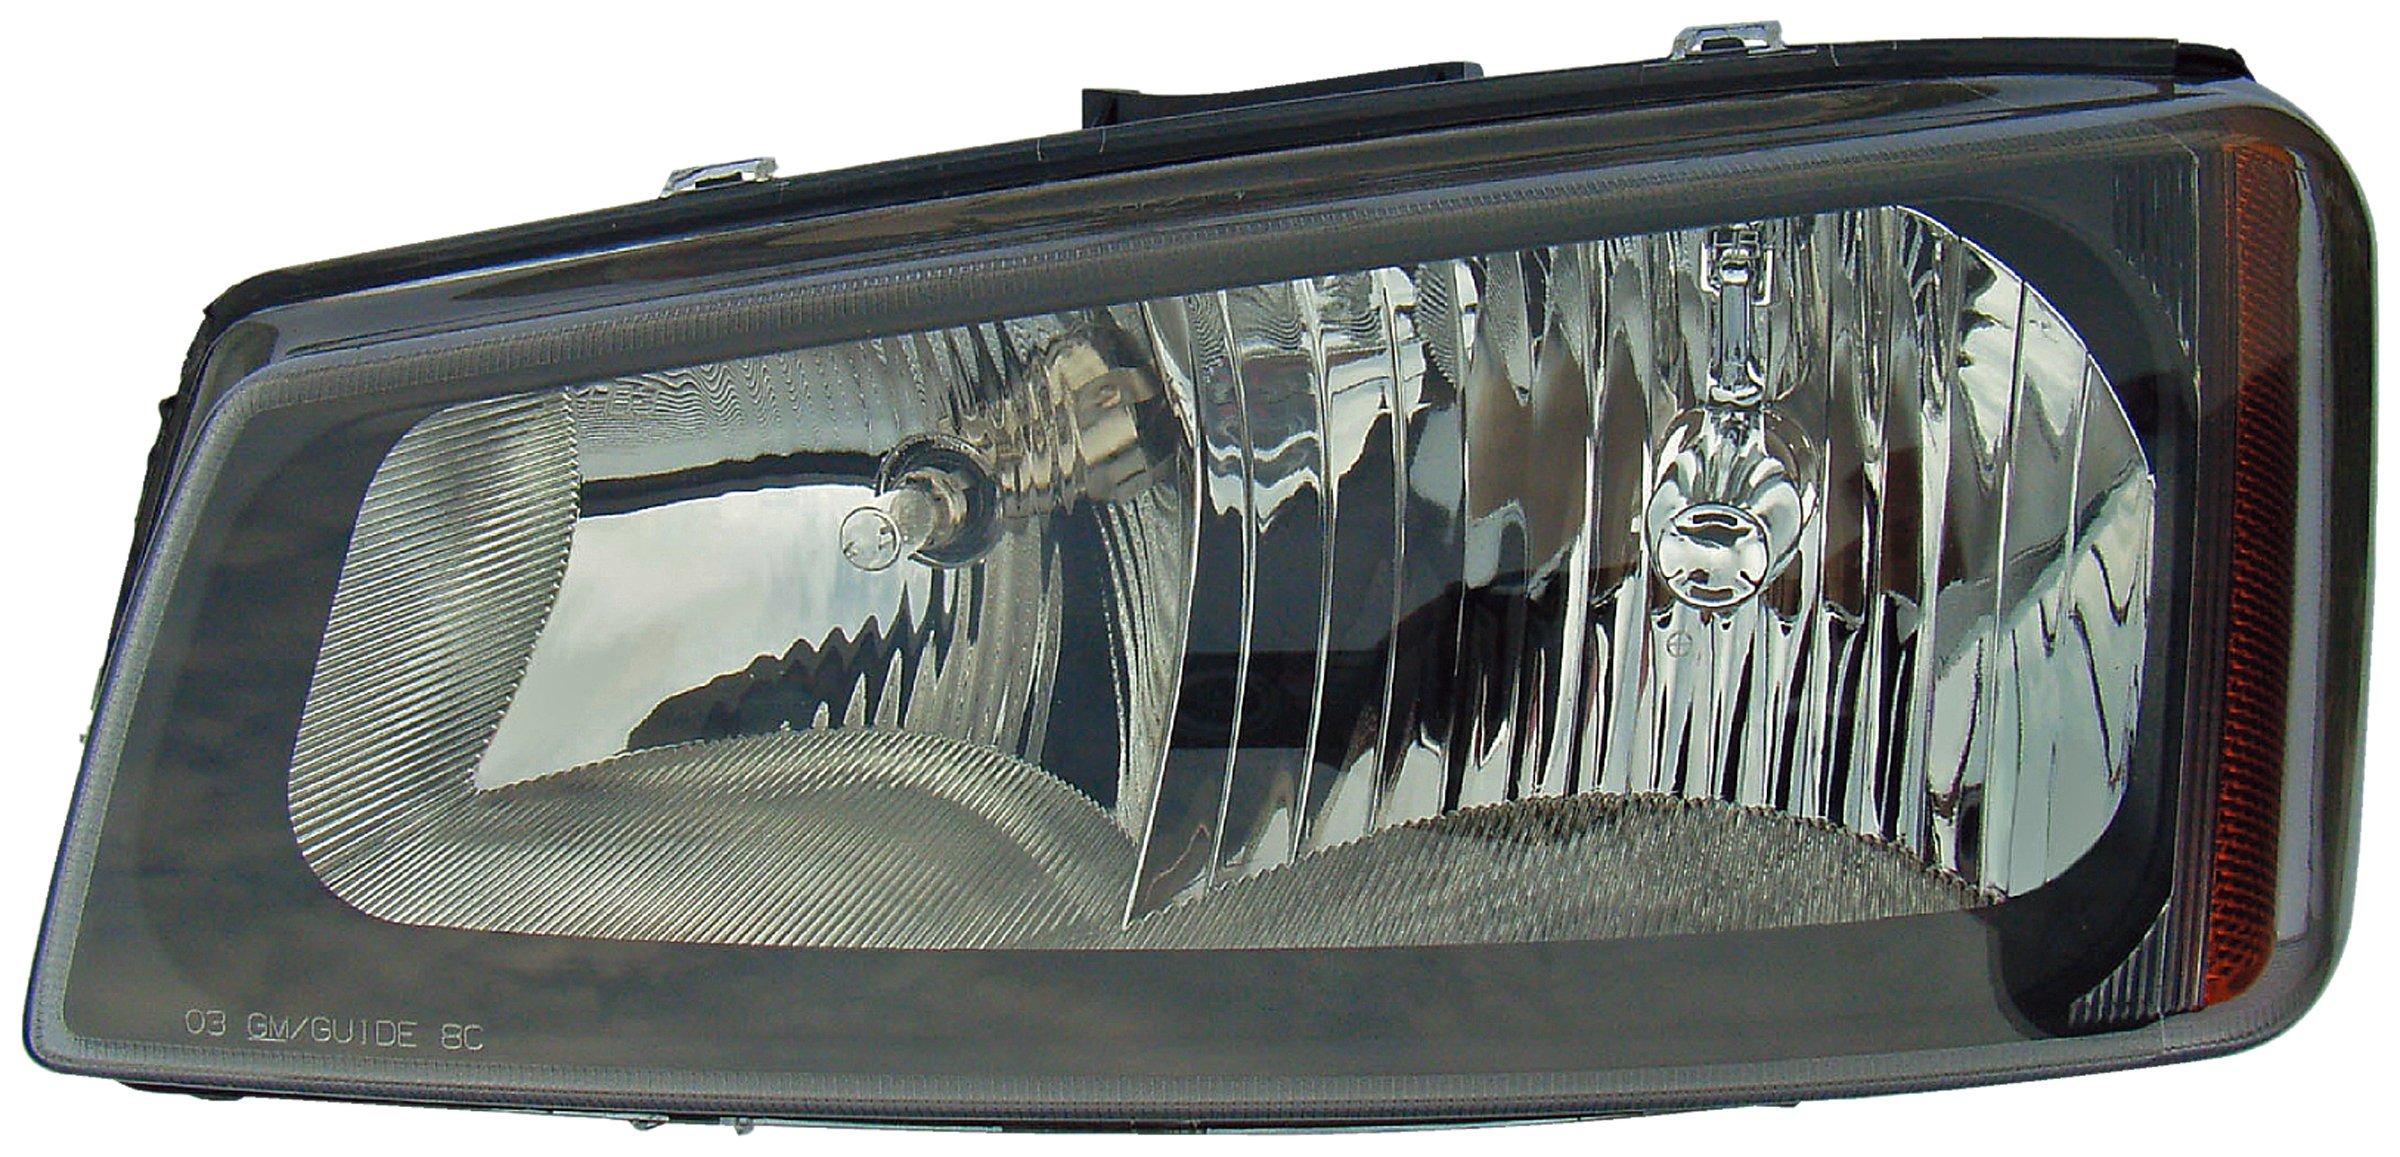 Parking Light Assembly for Select Chevrolet Models Dorman 1630148 Front Driver Side Turn Signal